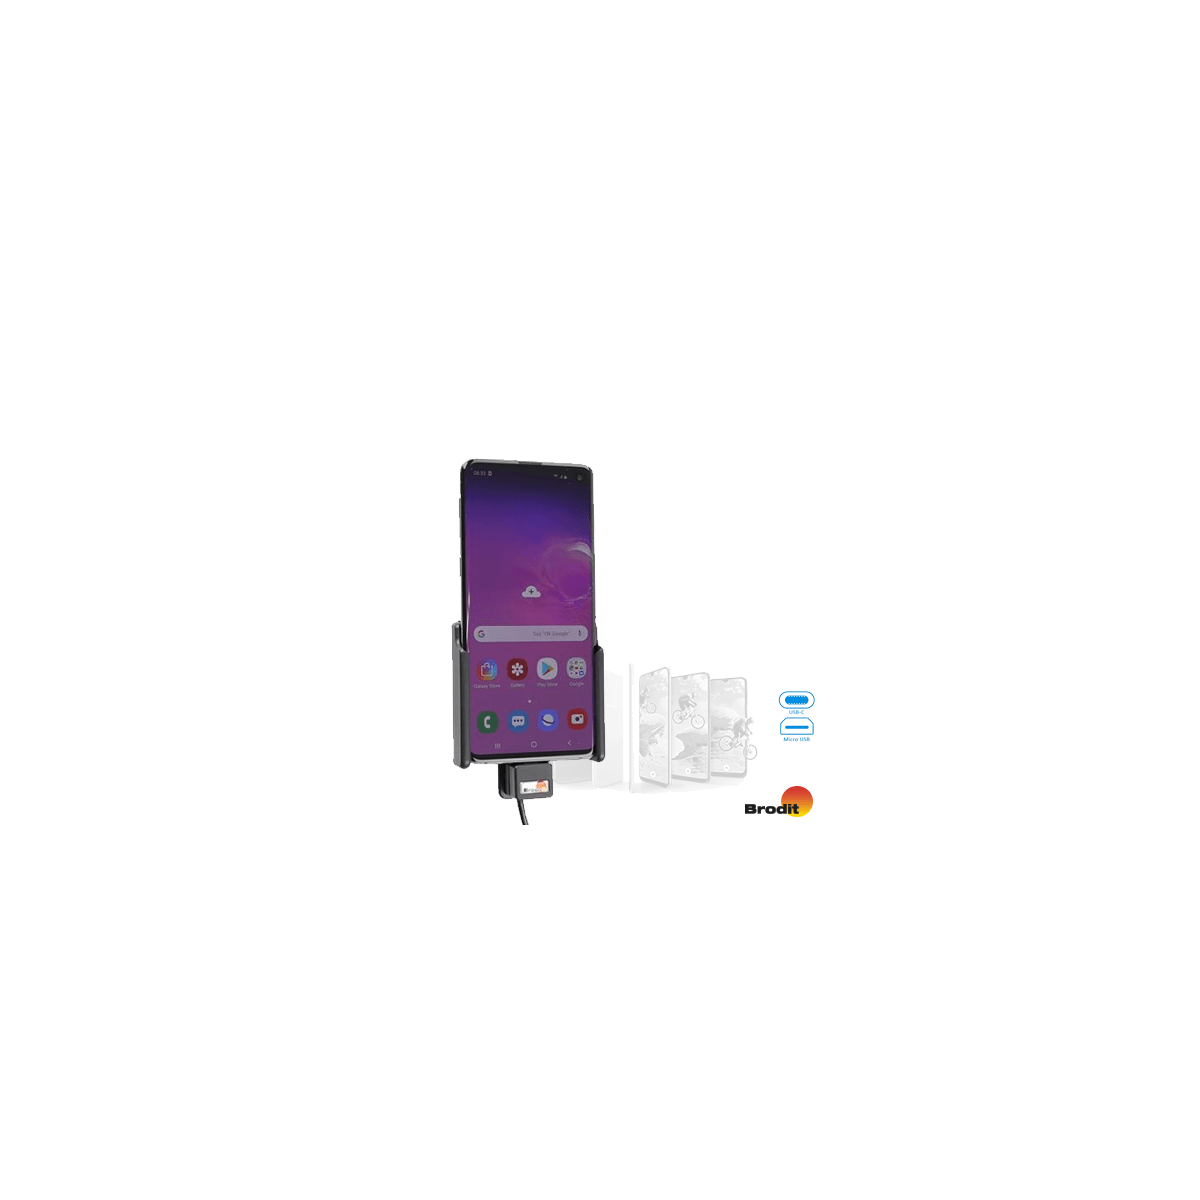 Samsung holders